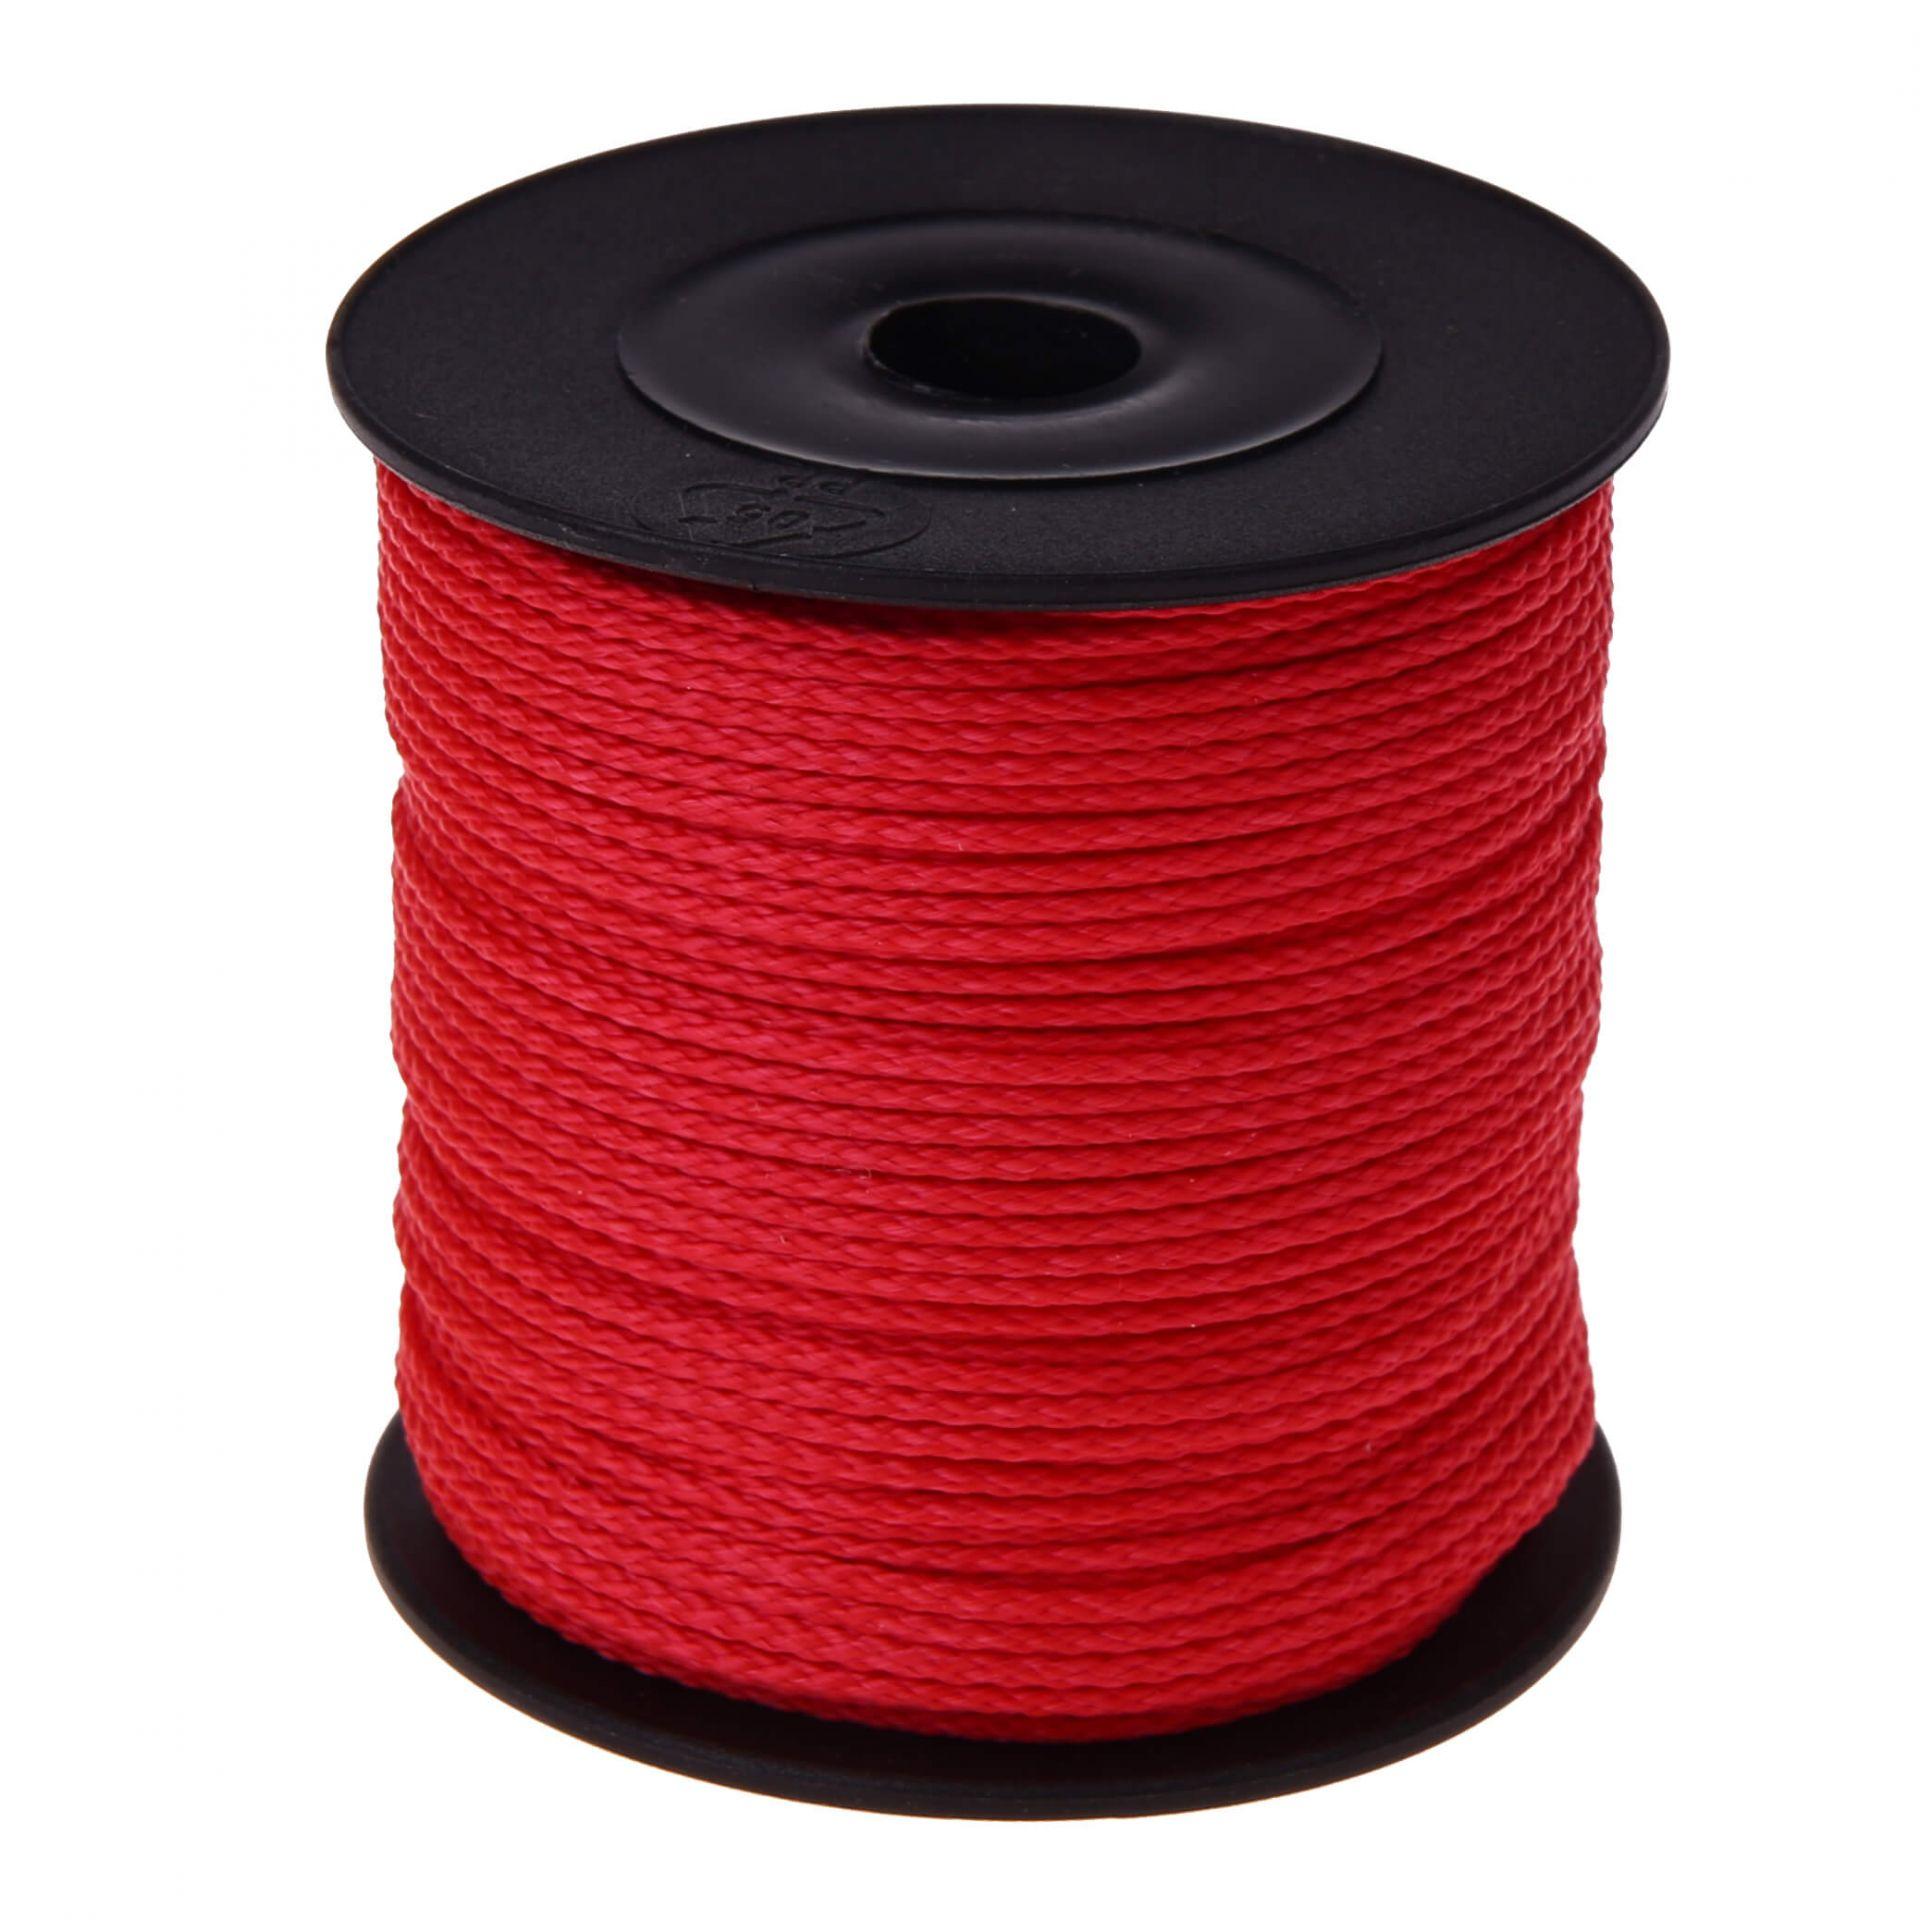 Polyester-Faden Ø 1,5mm • 1 Meter 'rot' 181 auf Lager